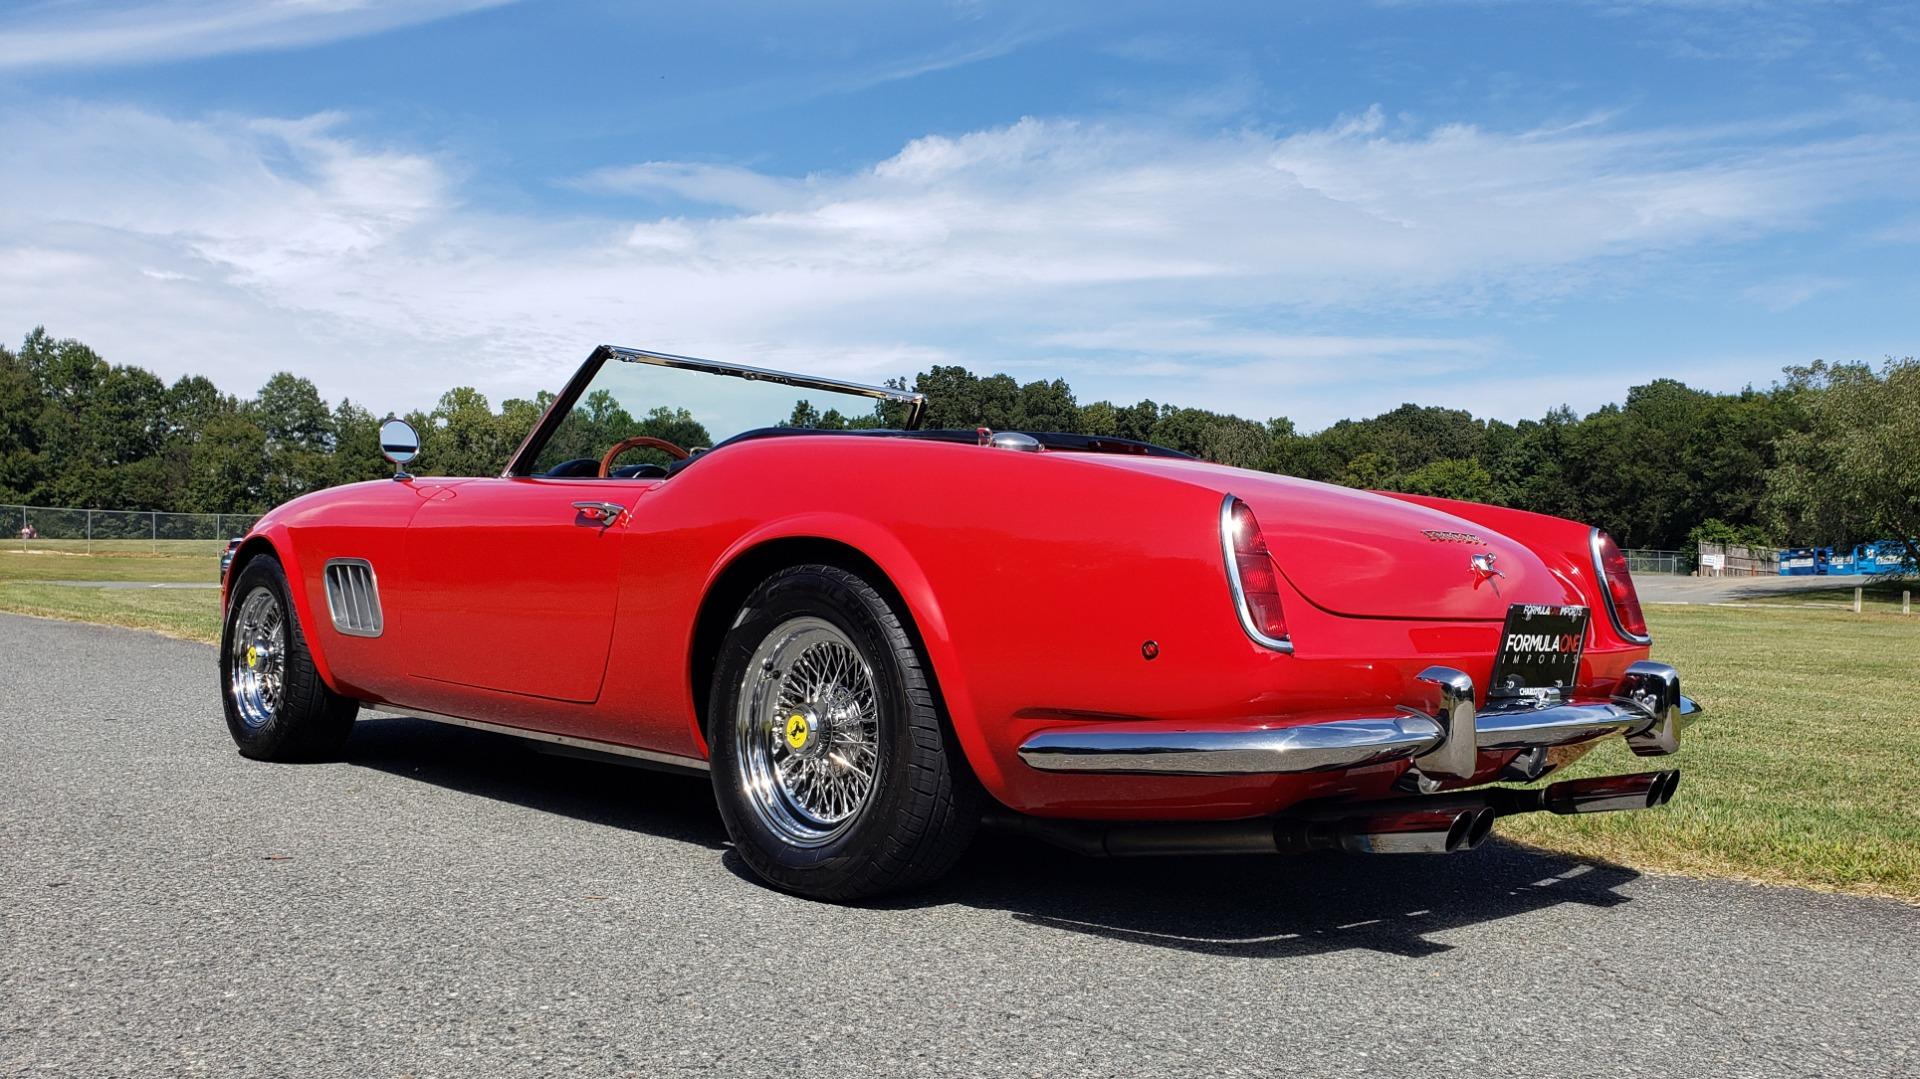 Used 1961 Ferrari 250GT SWB CALIFORNIA REPLICA / 302CI V8 / TREMEC 5-SPEED for sale Sold at Formula Imports in Charlotte NC 28227 12